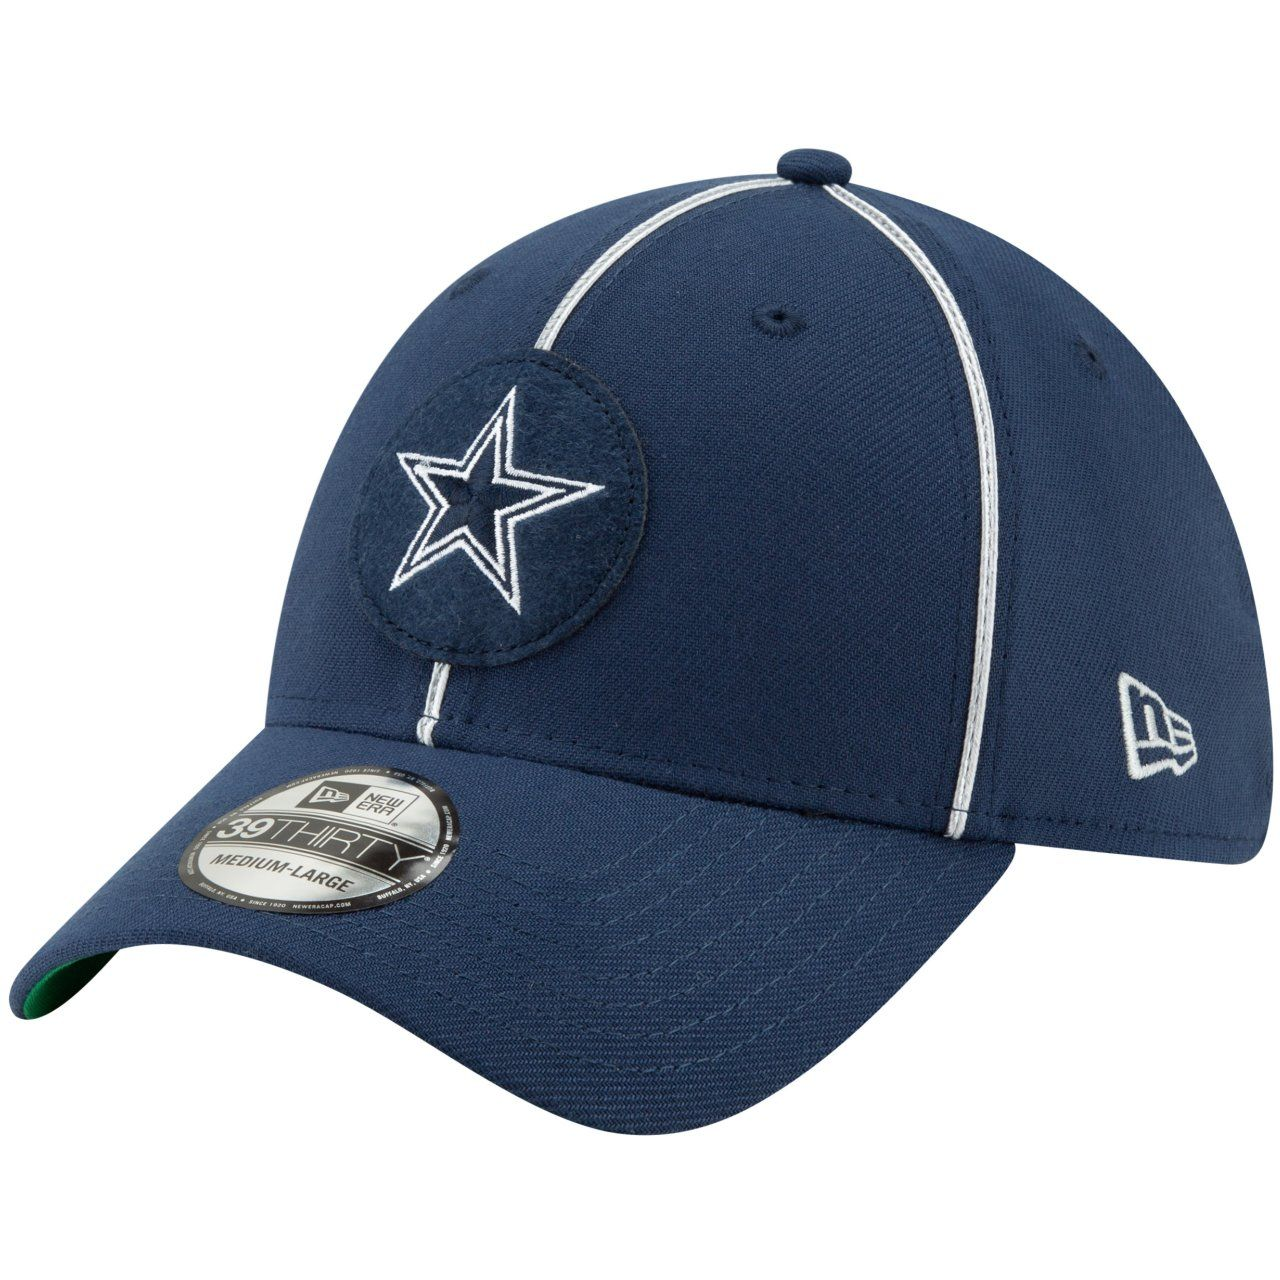 amfoo - New Era 39Thirty Cap - Sideline 1920 Home Dallas Cowboys